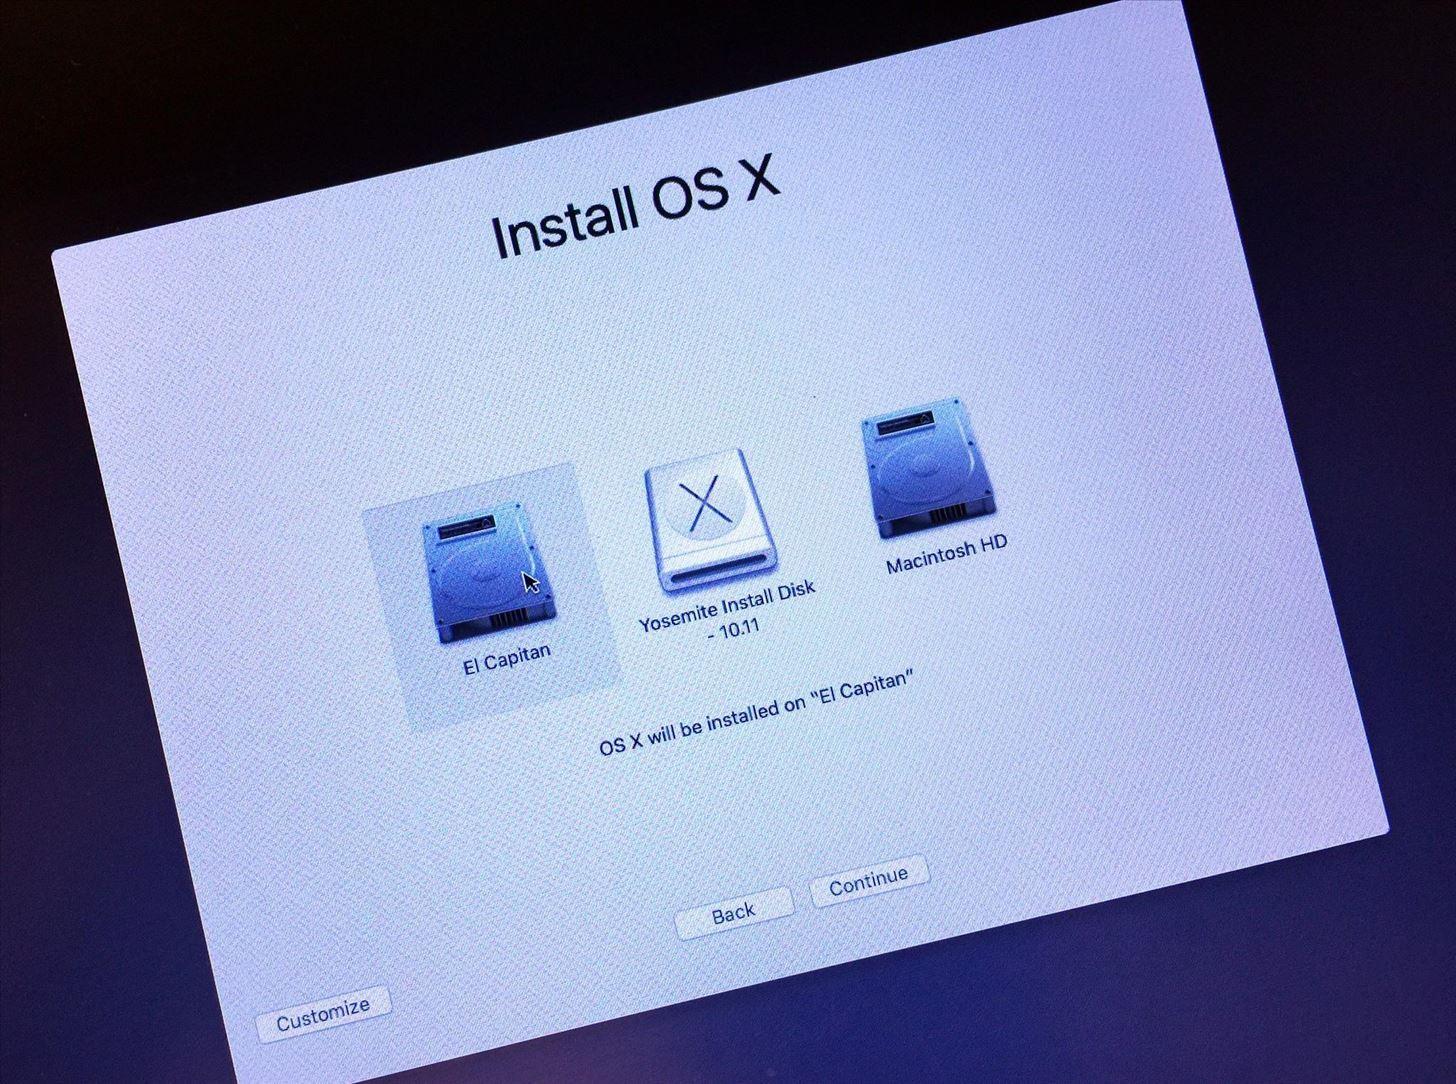 How to Create a Bootable Install USB Drive of Mac OS X 10.11 El Capitan